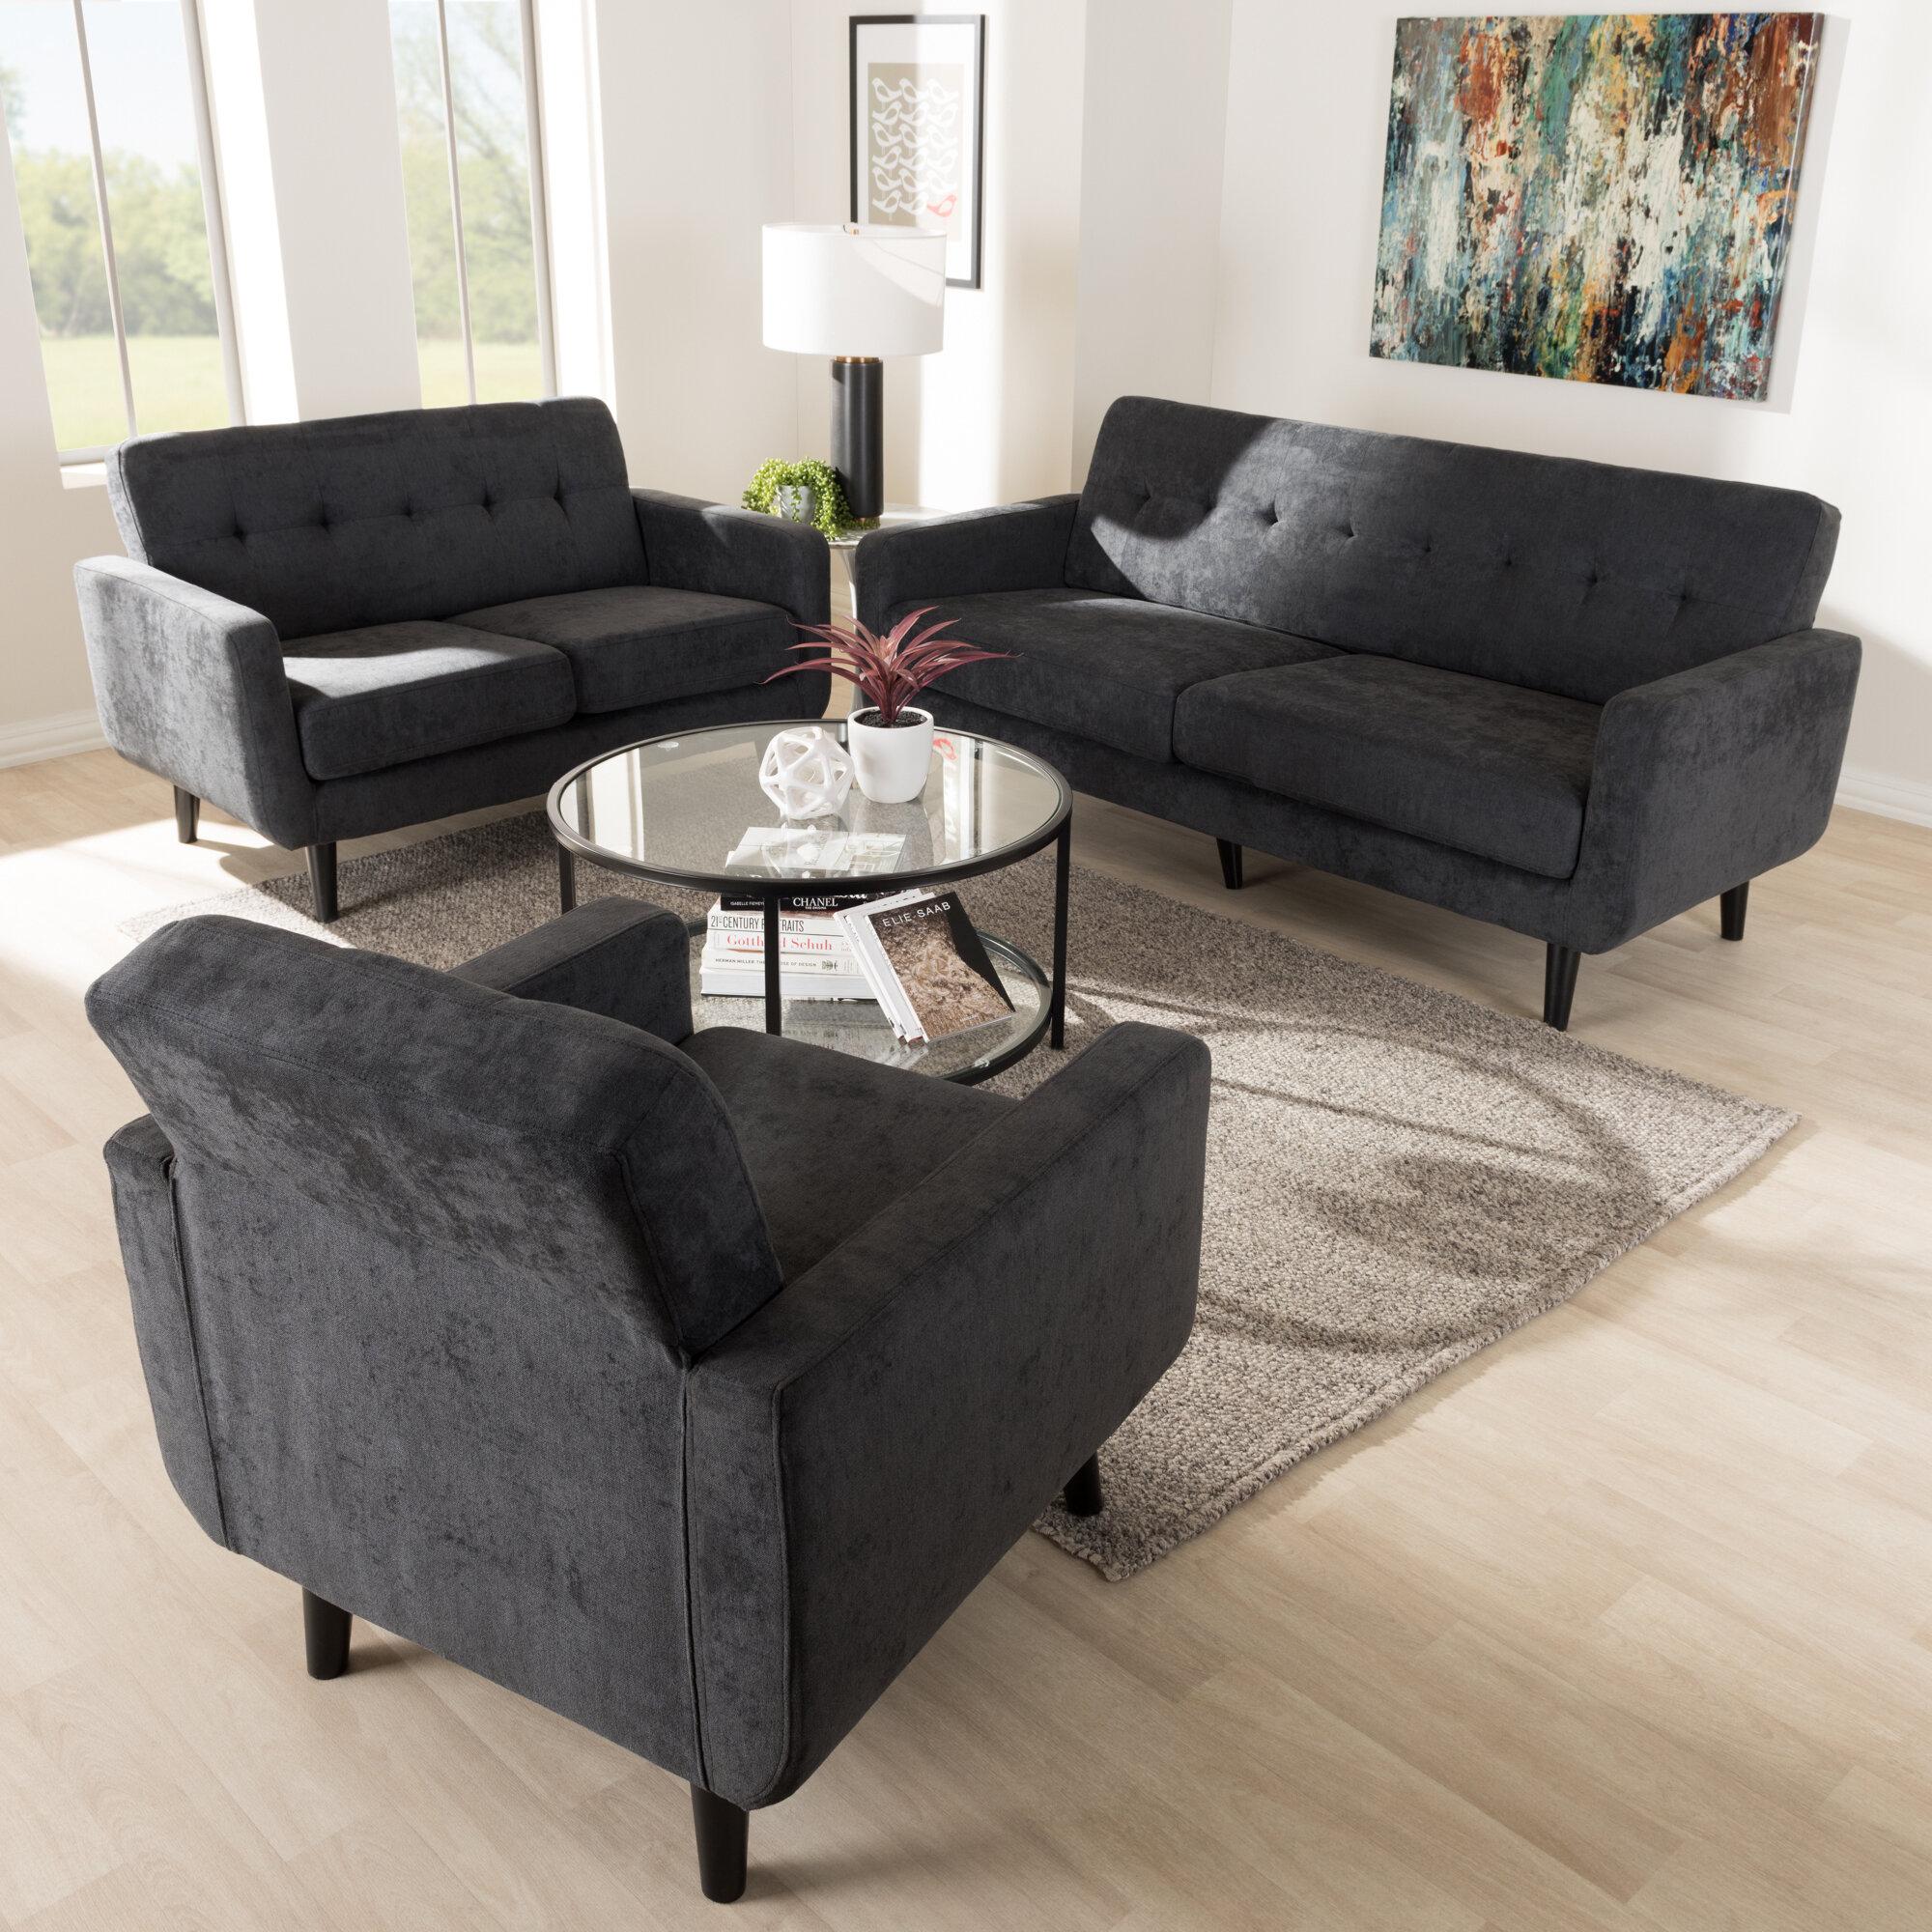 George Oliver Ripton Mid Century Modern Coffee Table: George Oliver Doty Mid Century Modern Upholstered 3 Piece